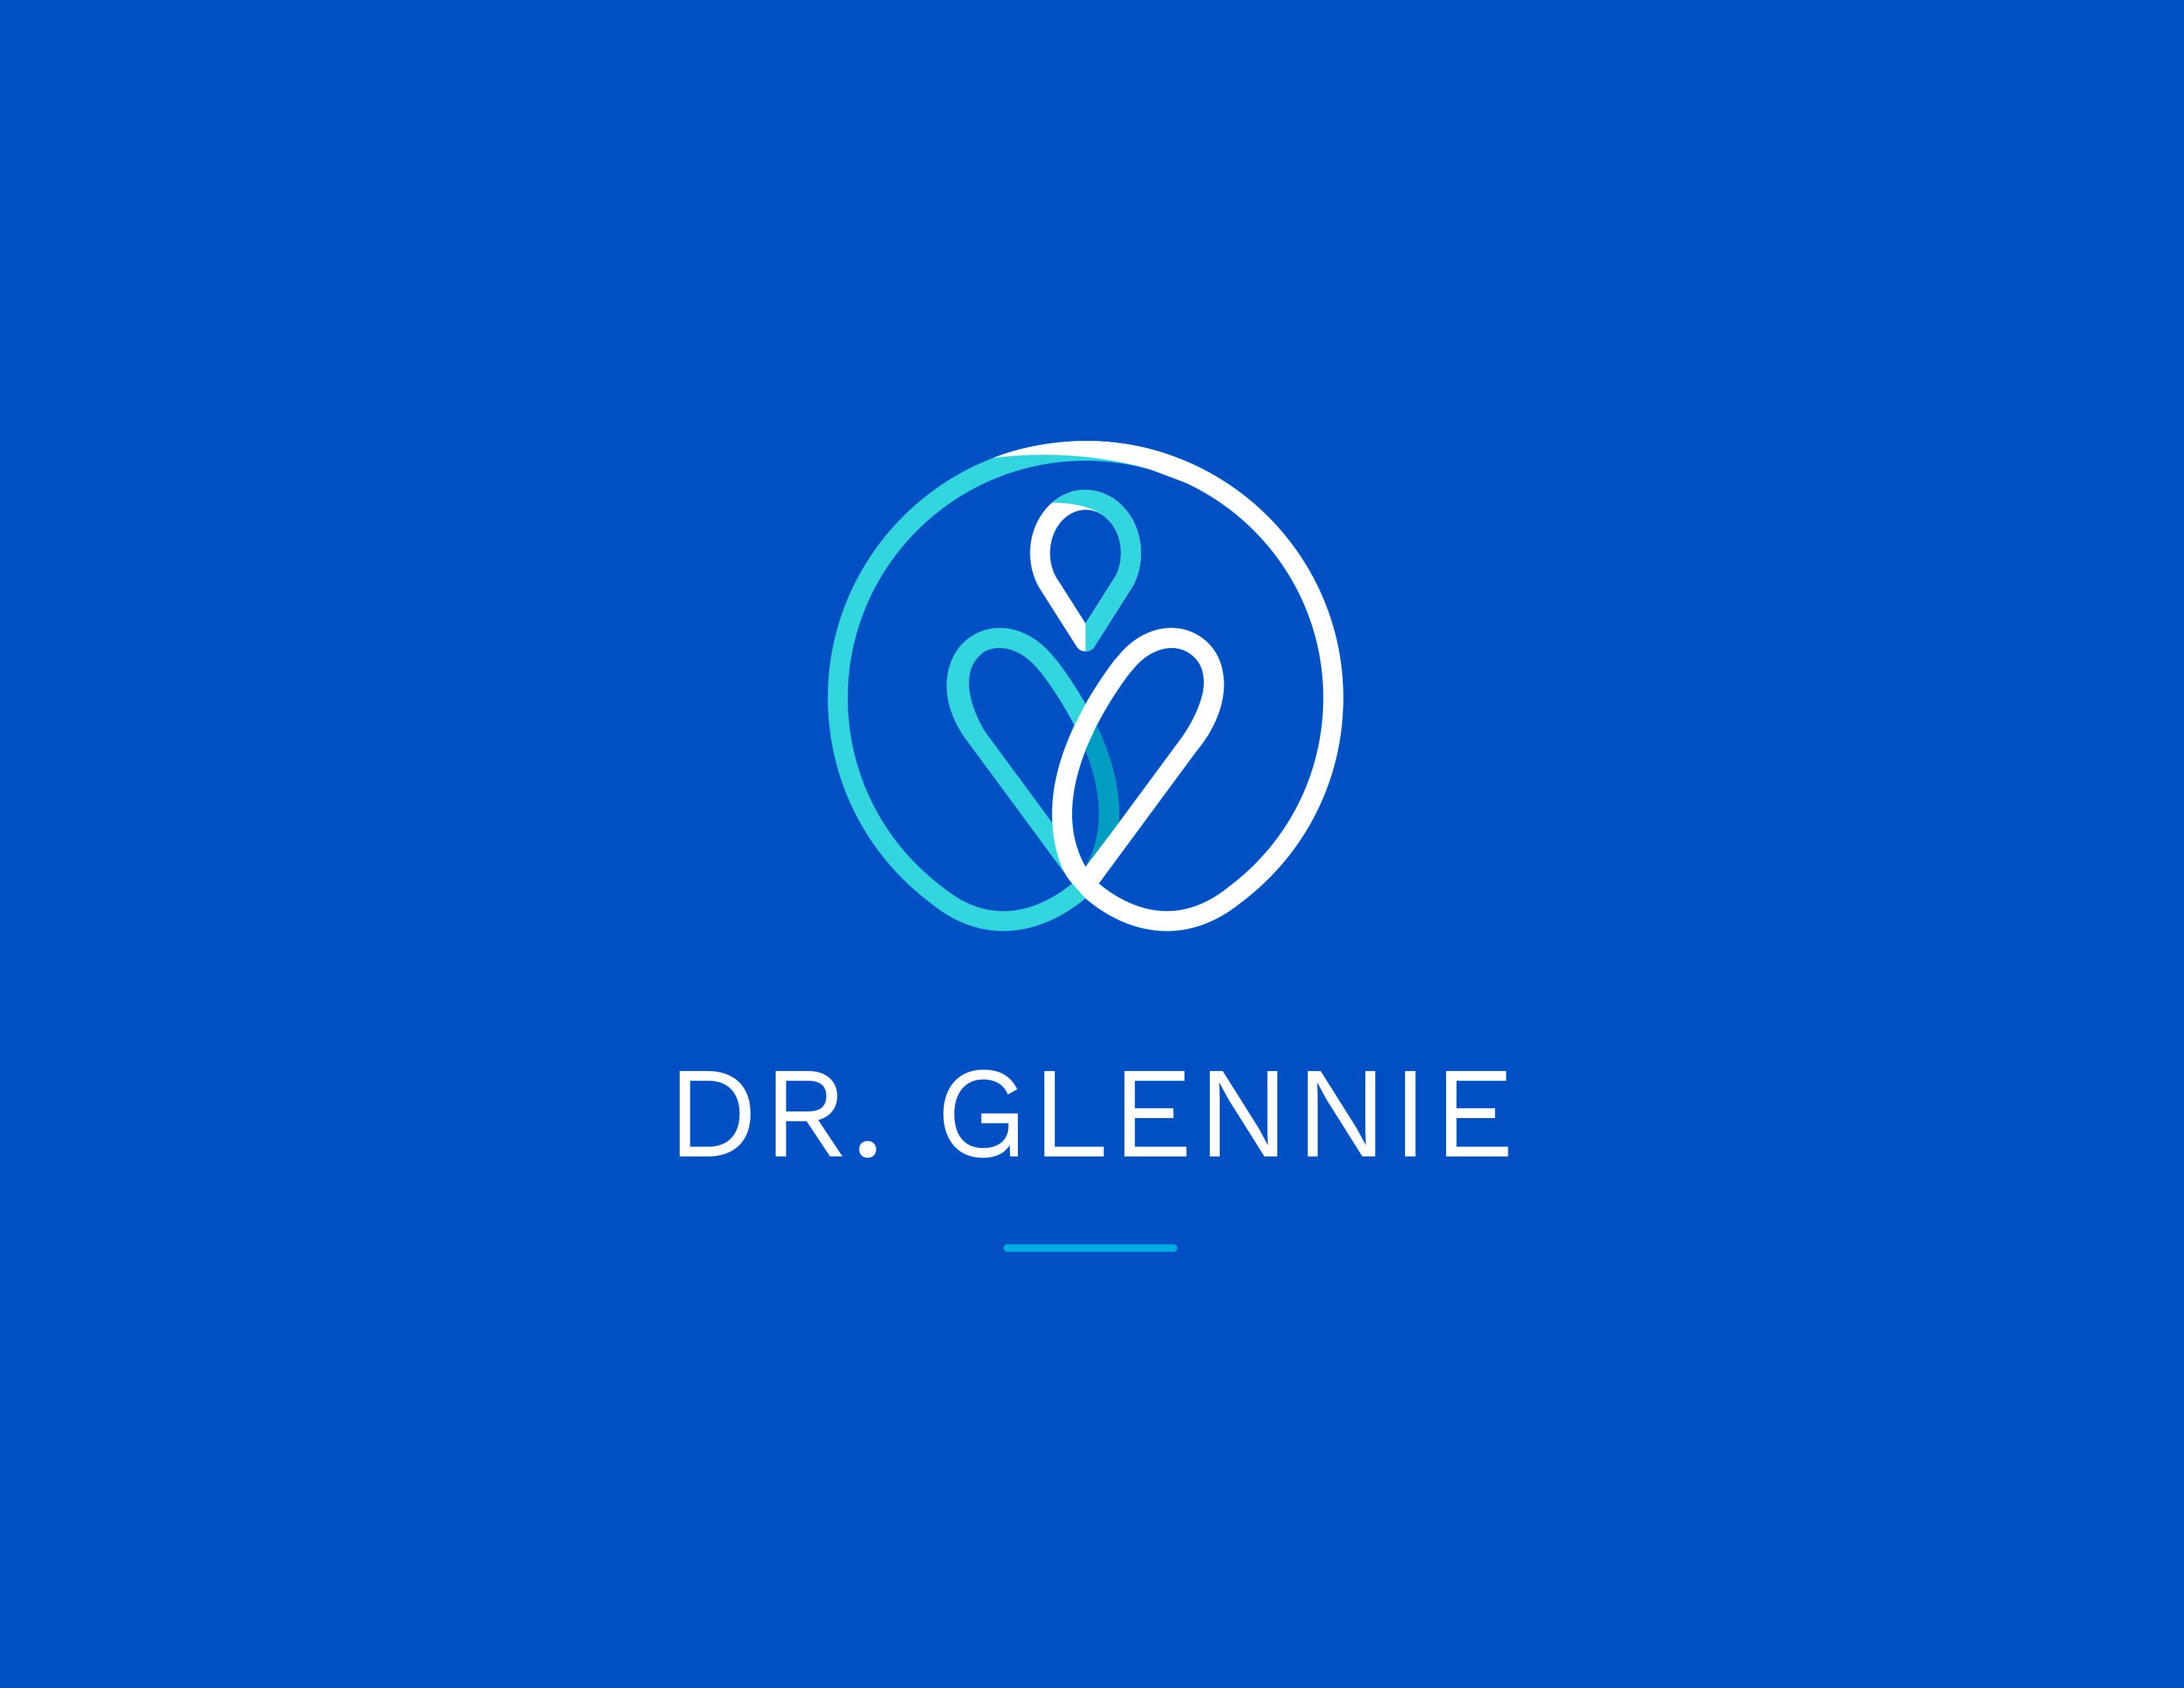 Dr. Mauricio Glennie Porras